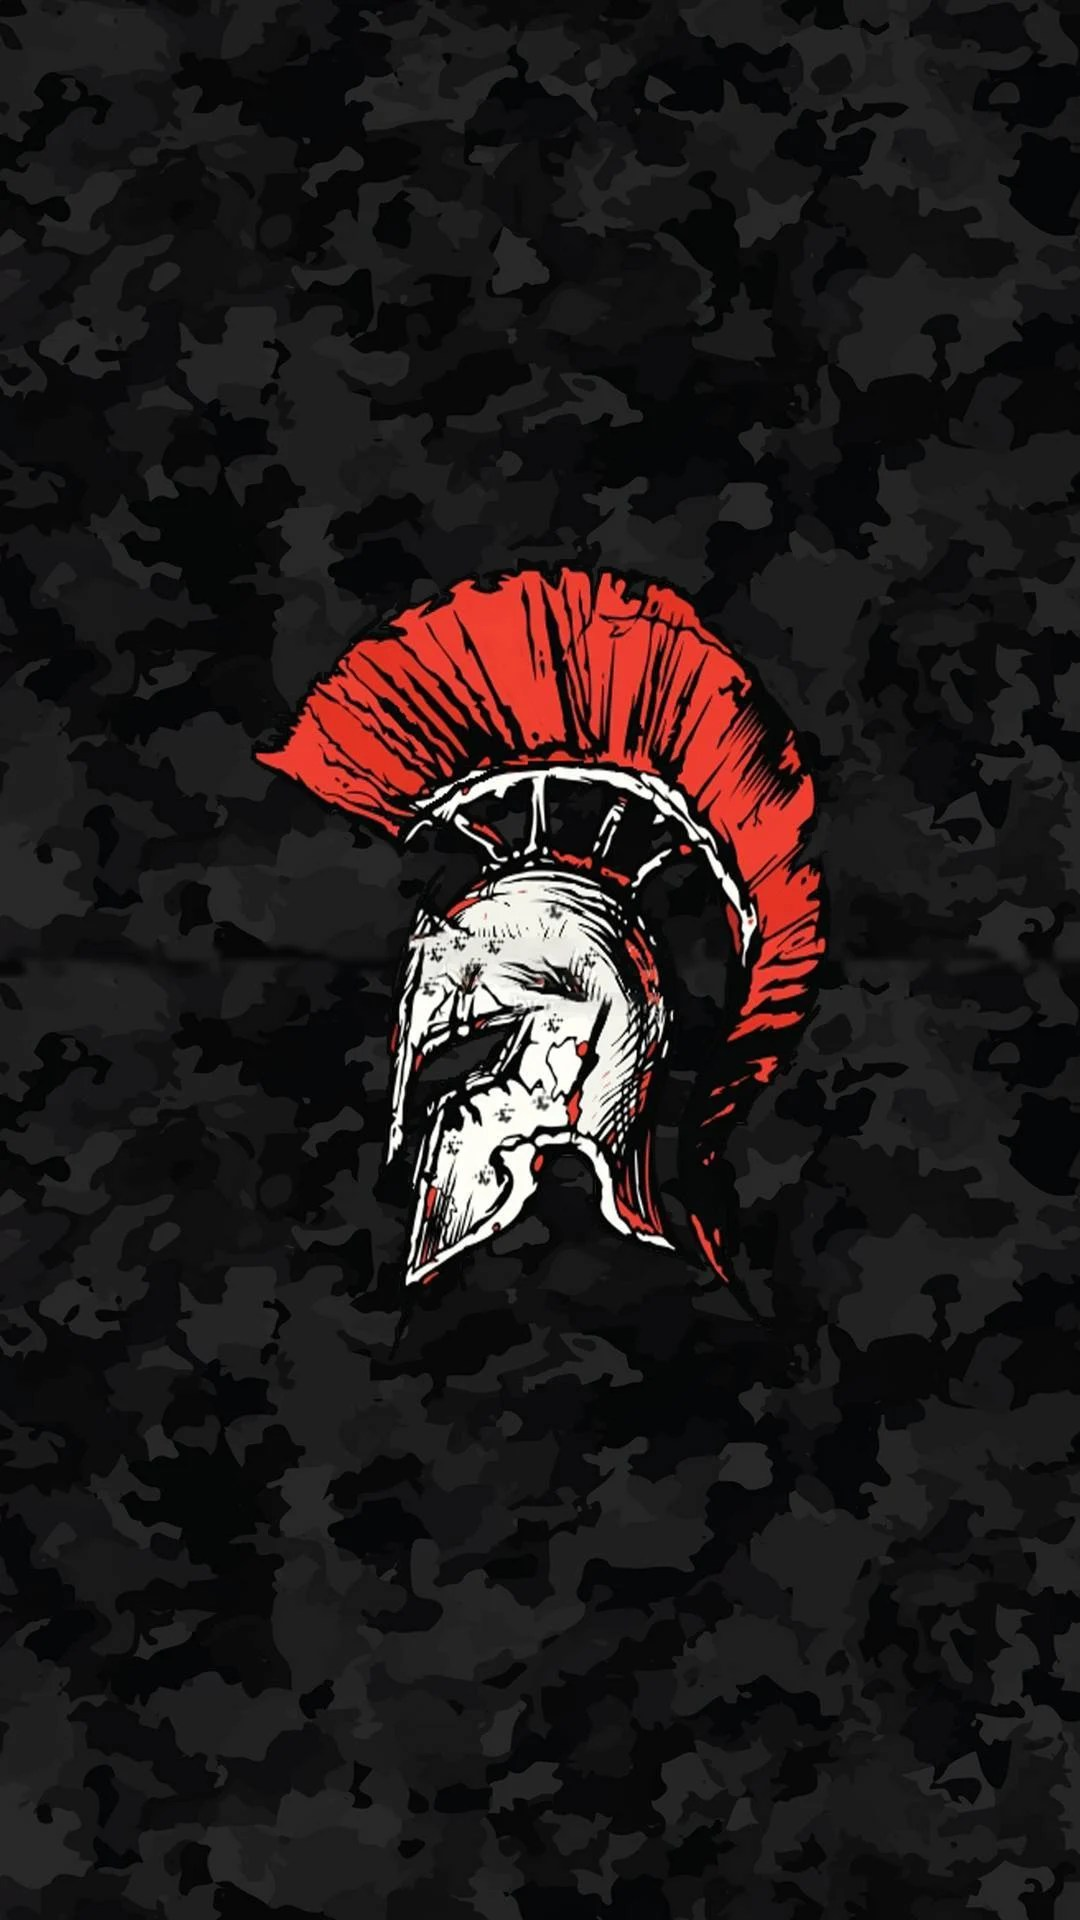 Spartan Helmet Wallpaper : spartan, helmet, wallpaper, Spartan, Helmet, Wallpapers, Wallpaper